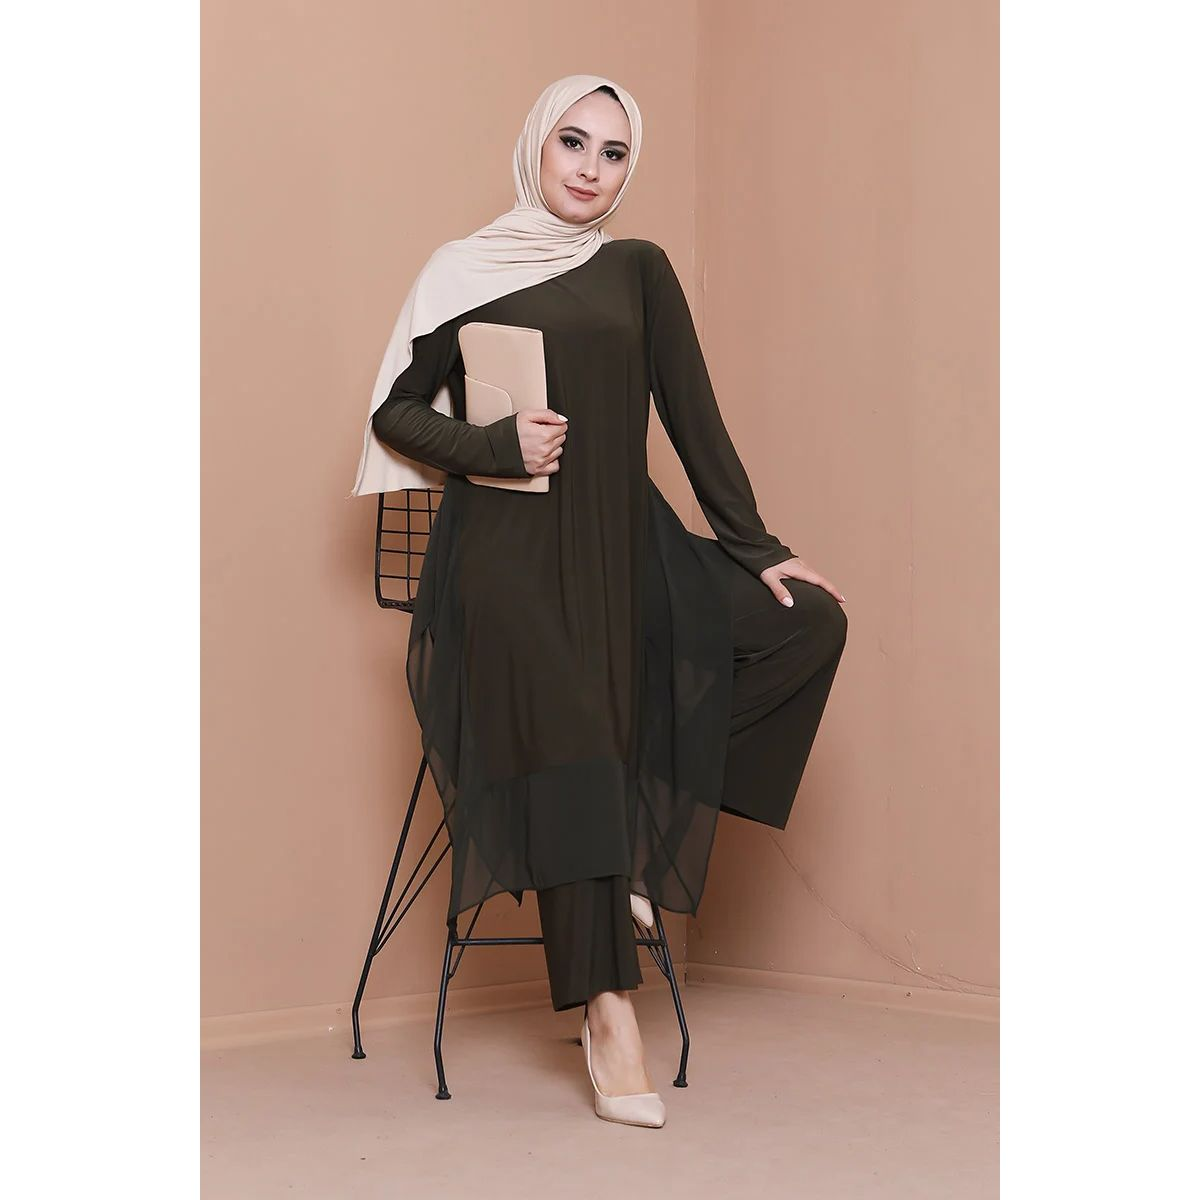 2 Pieces Muslim Women Set Muslim Sets Hijab Abaya Kaftan Caftan Patns and Tunic Set Muslim Women Fashion Long Dress Turkey Dubai